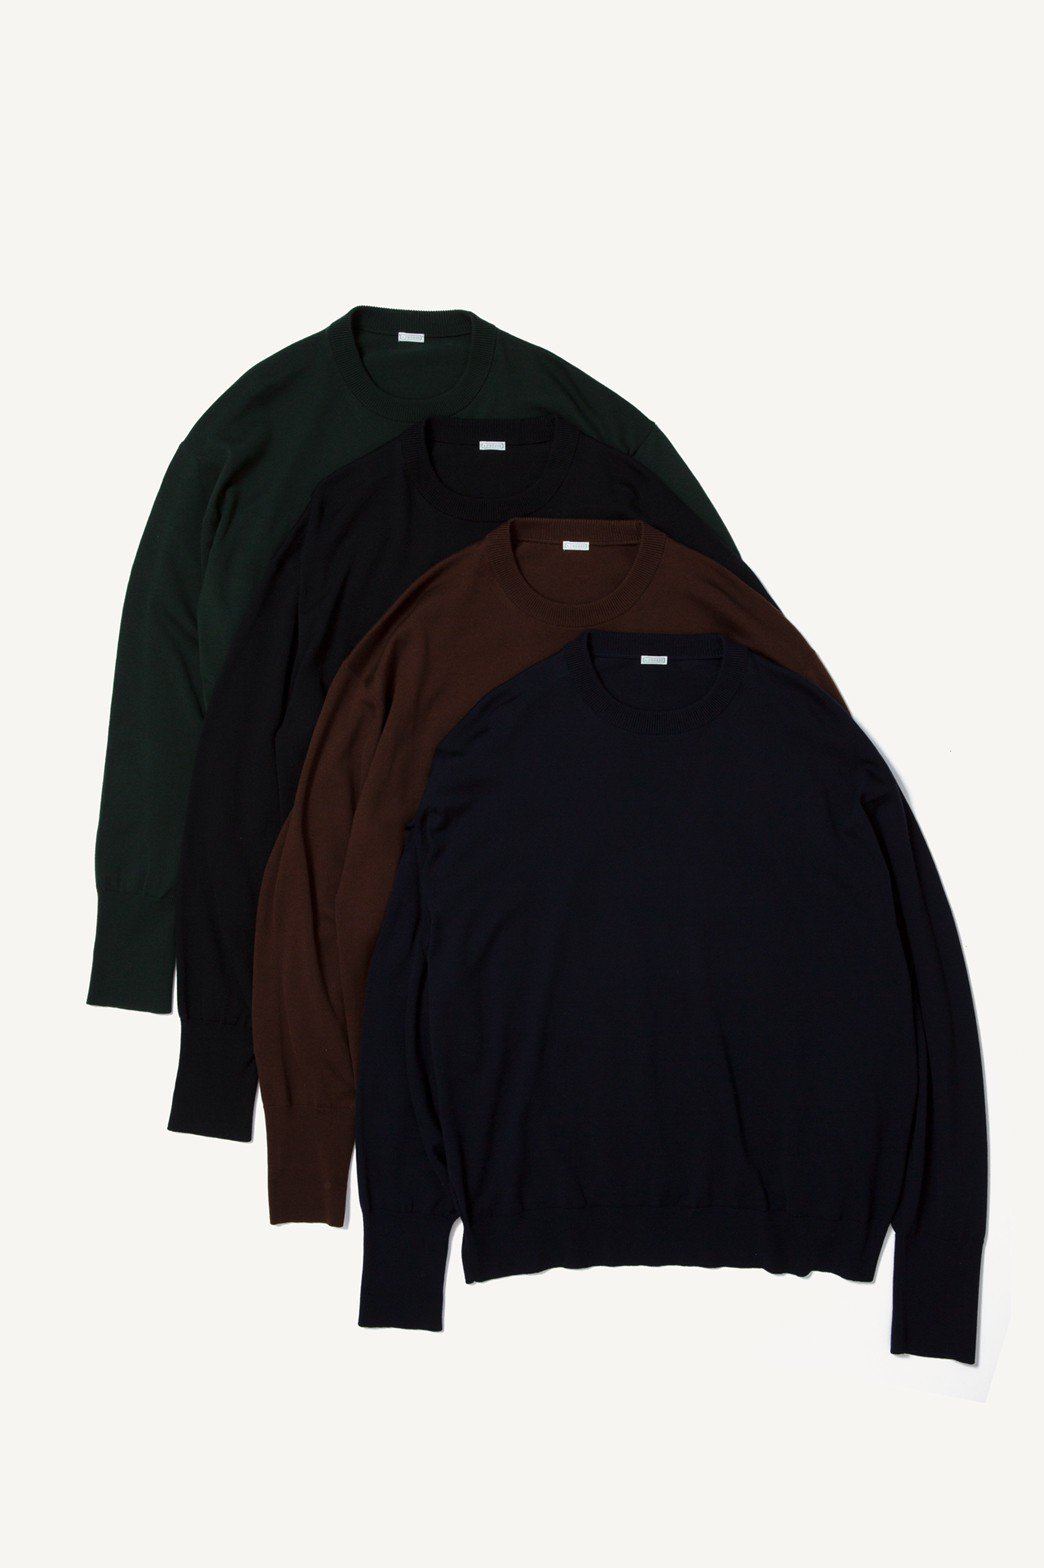 A.PRESSE / LONG SLEEVE Knit T-Shirt